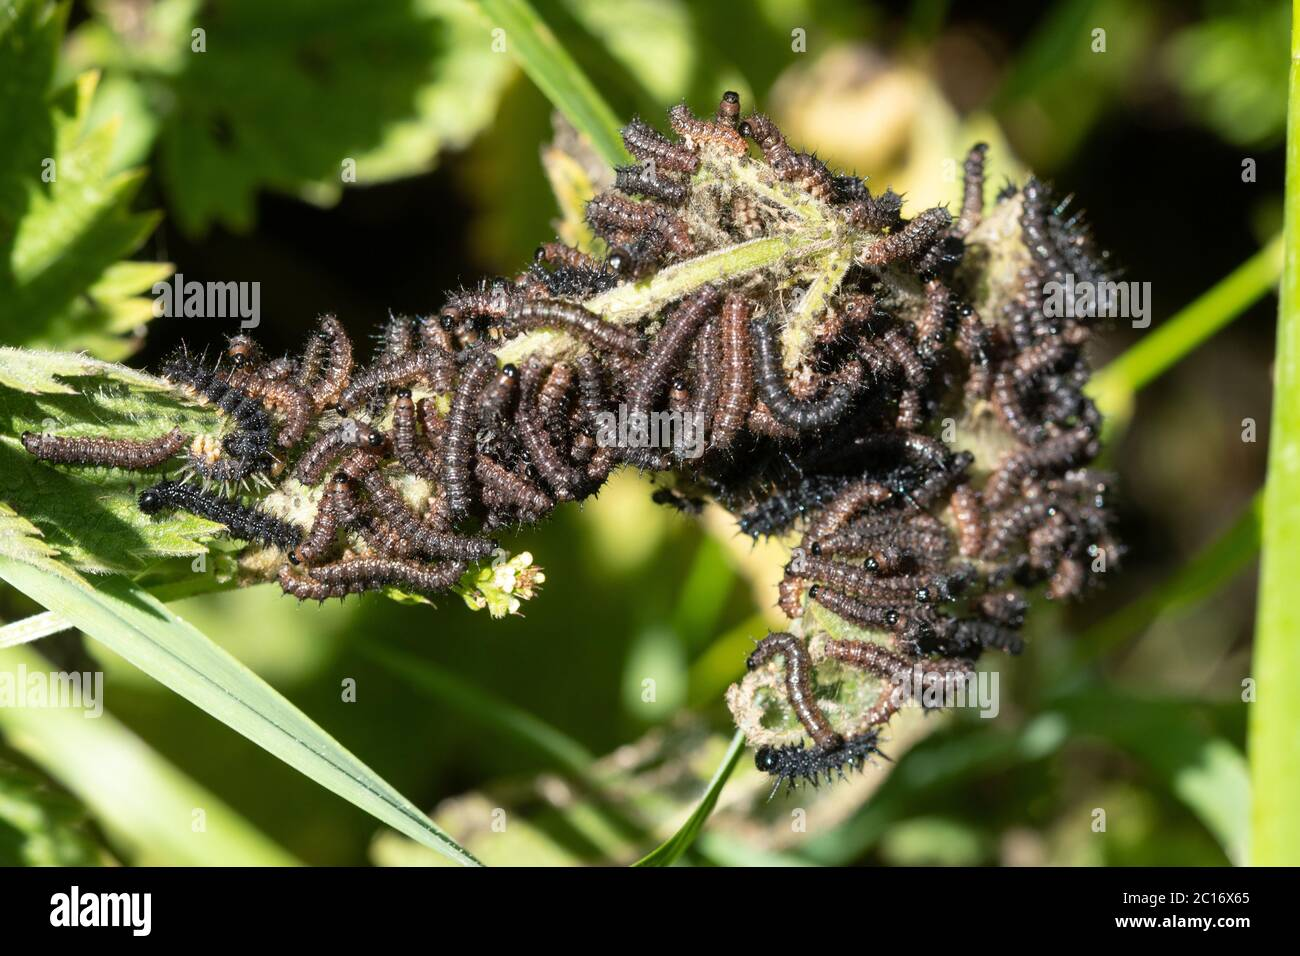 larvae-caterpillars-of-the-peacock-butterfly-aglais-io-basking-and-feeding-on-stinging-nettle-uk-2C16X65.jpg